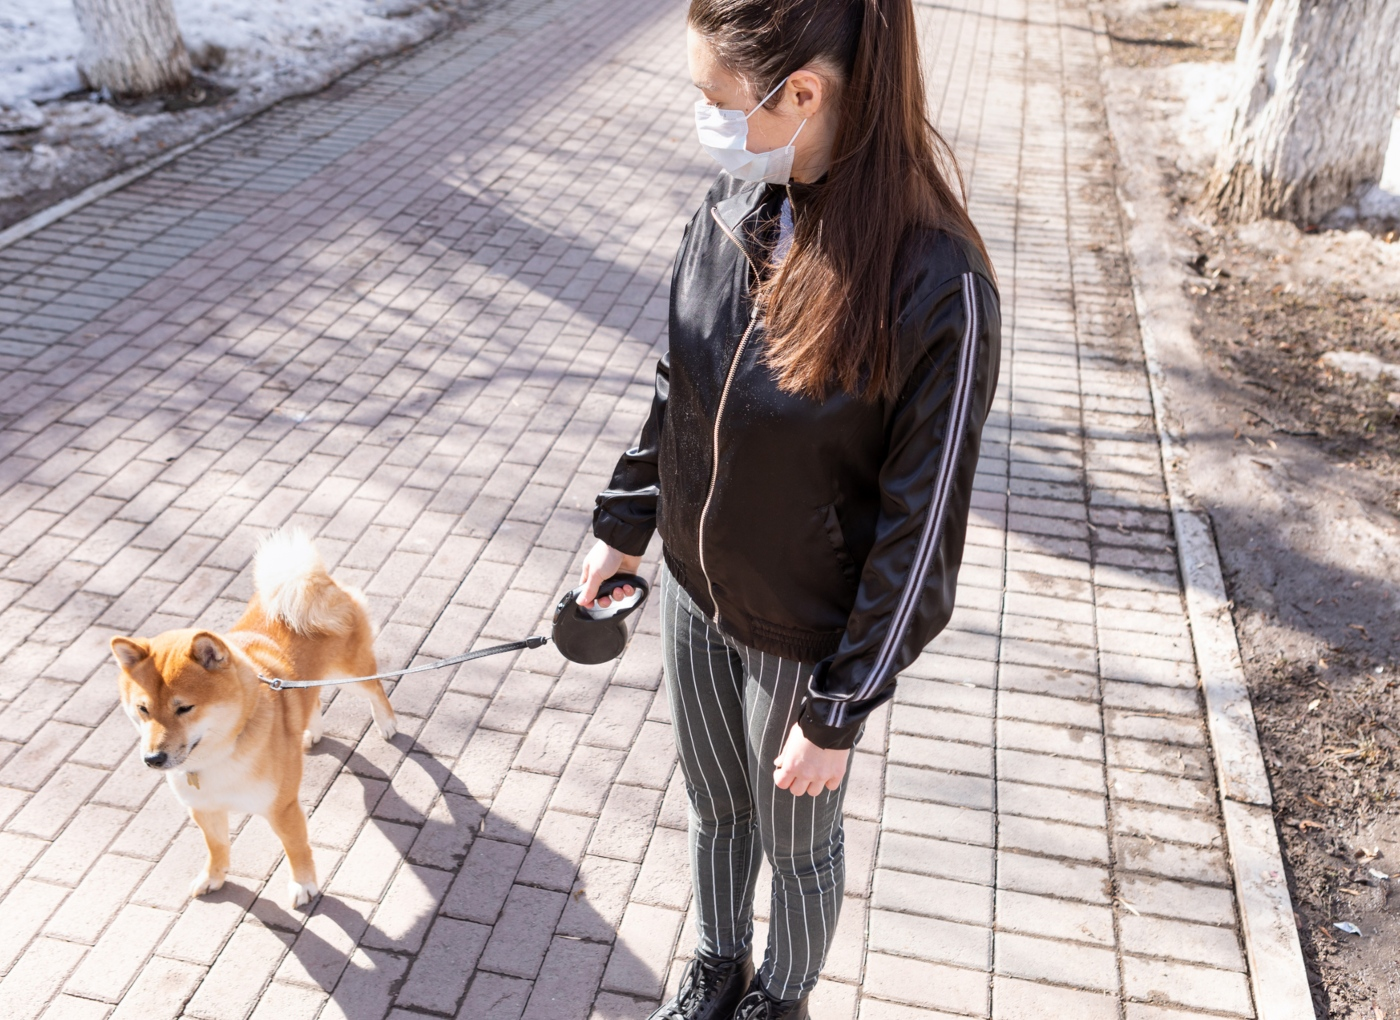 COVID-19: passear o cão e usar máscara